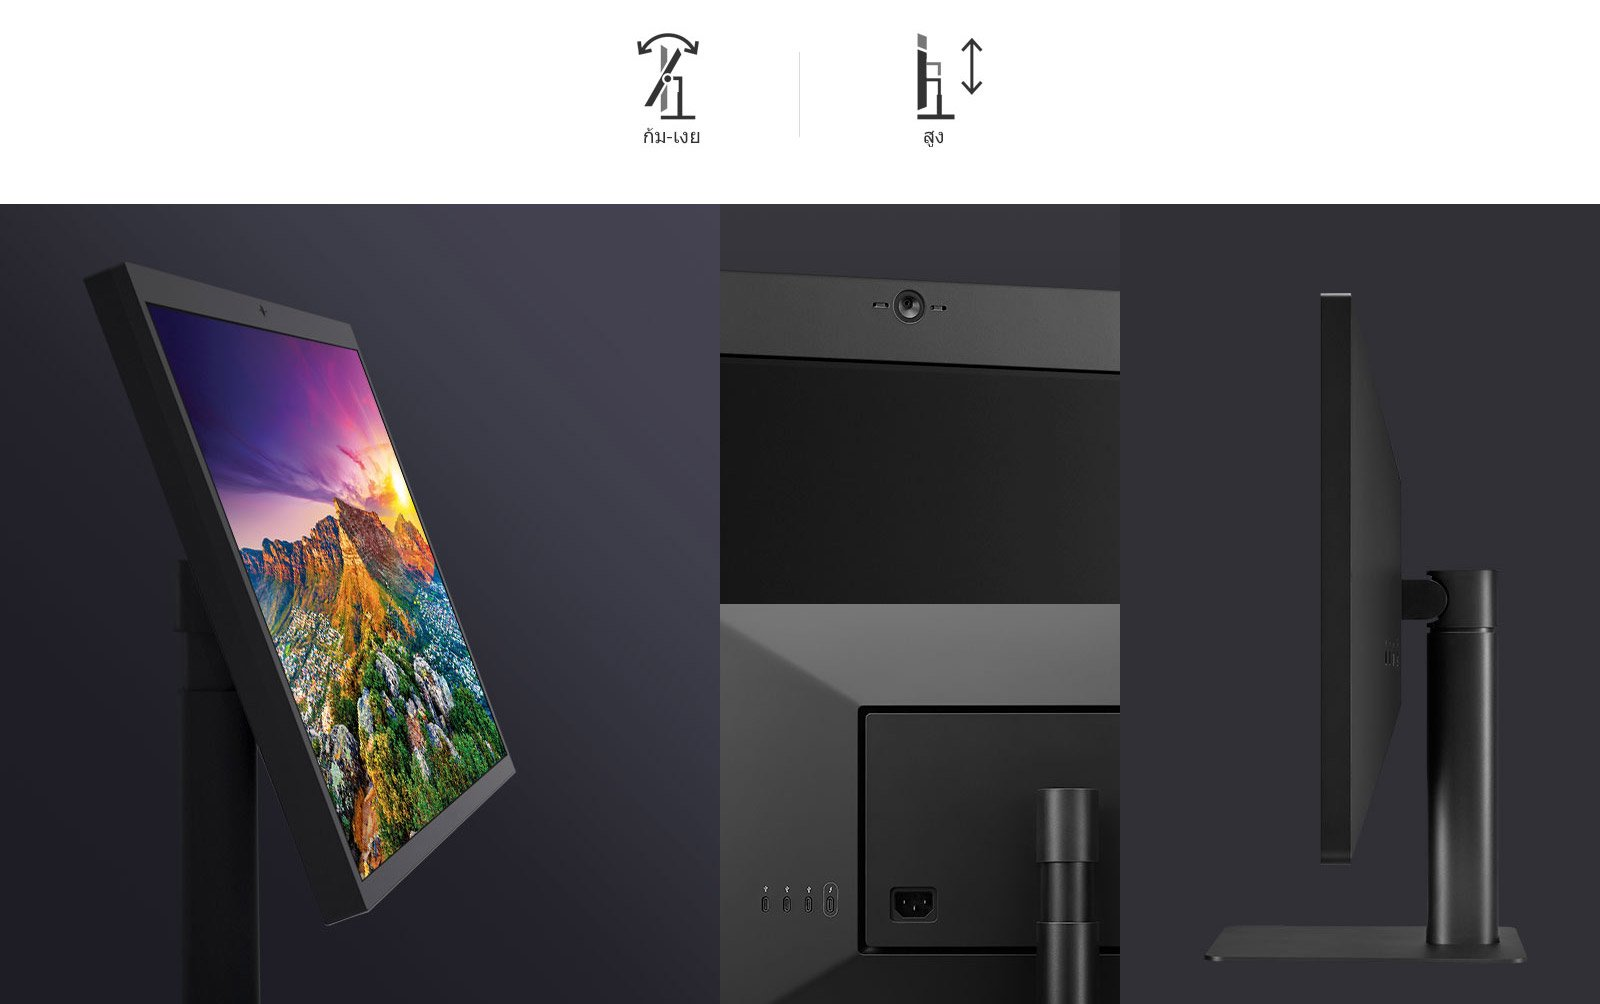 LG MONITOR 27MD5KL-B.ATM (IPS 5k for Mac)